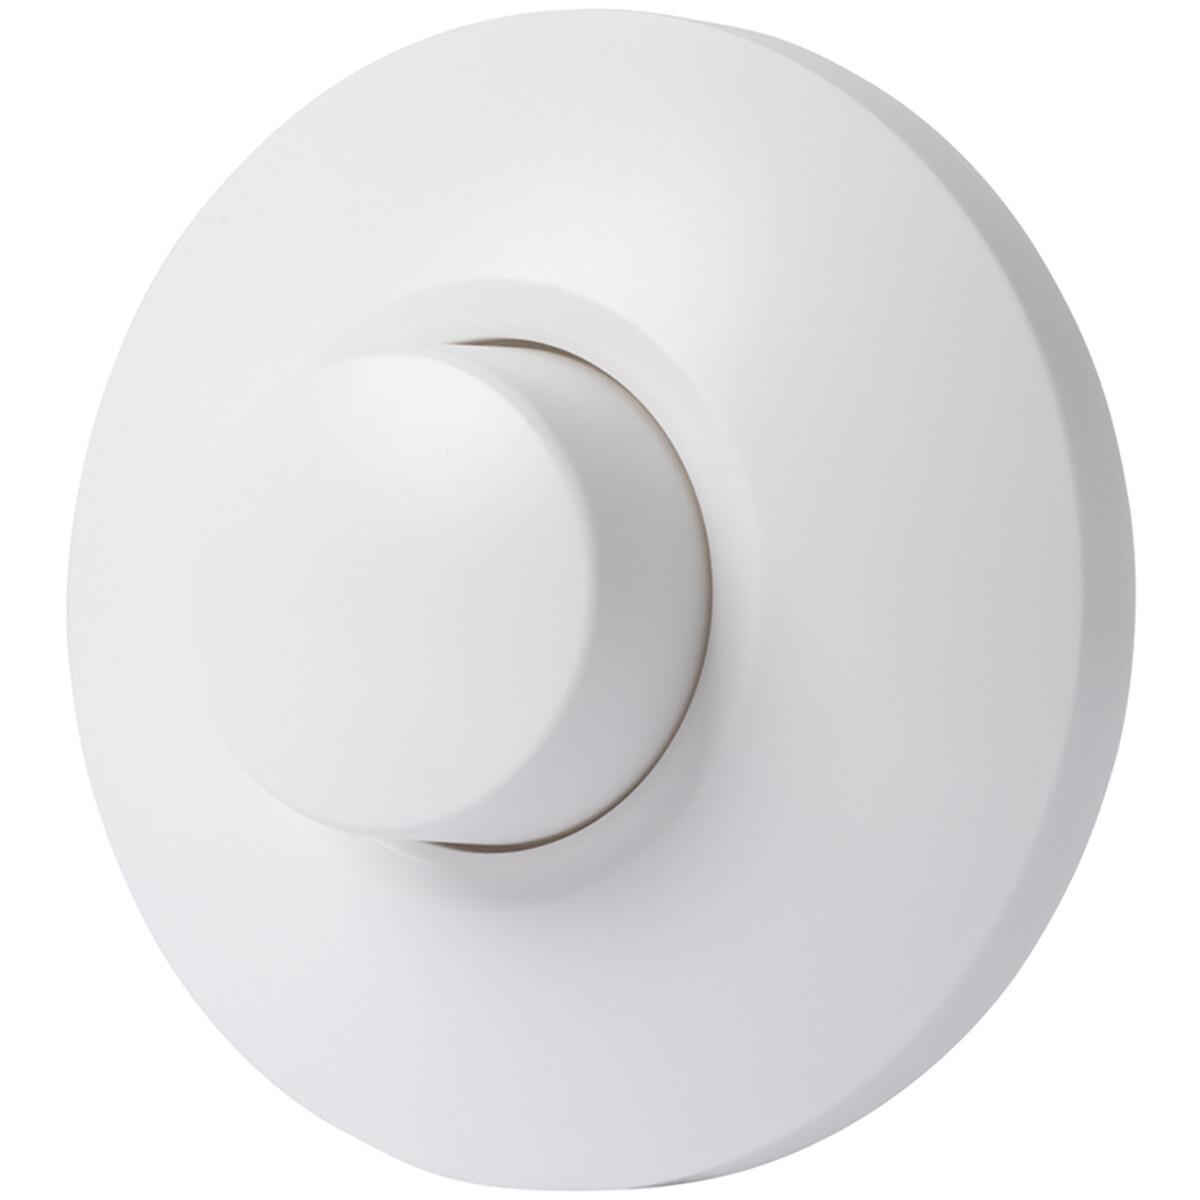 EcoDim - LED Vloerdimmer - ECO-DIM.09 - Fase Afsnijding RC - Enkel Knop - 0-50W - Rond - Mat Wit